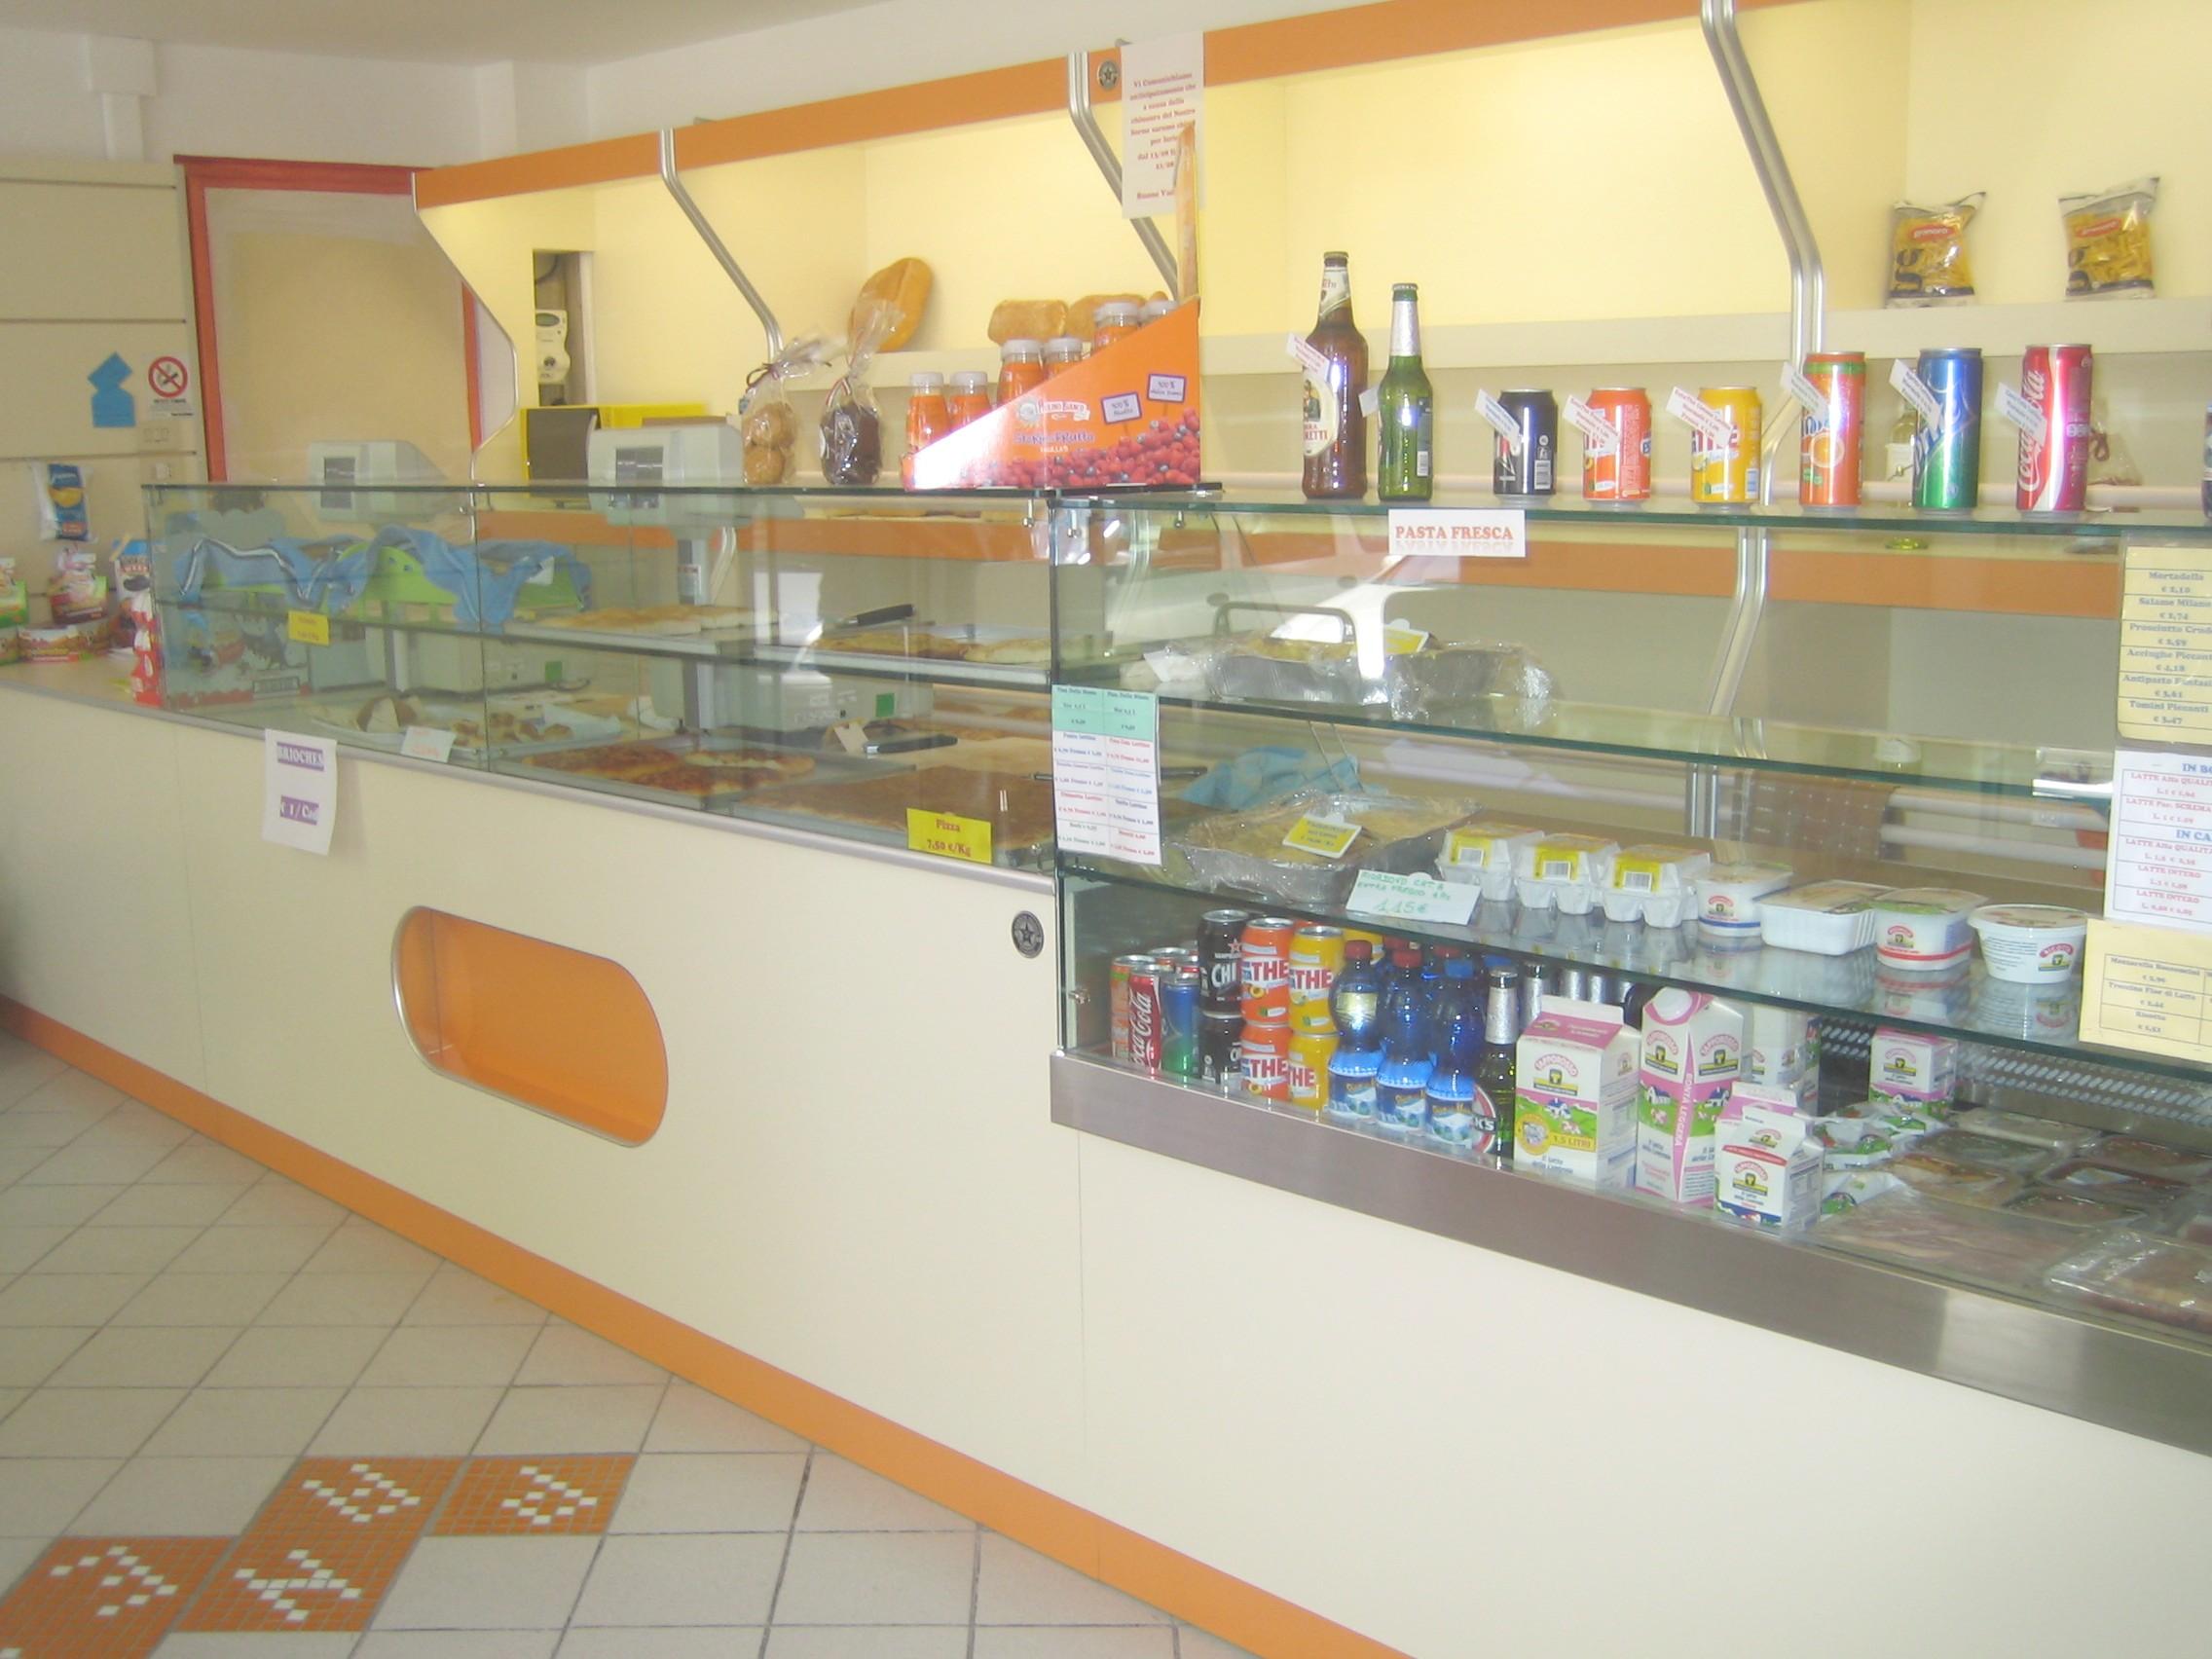 Produttori di arredamenti per bar negozi ristoranti for Negozi mobili perugia arredamento